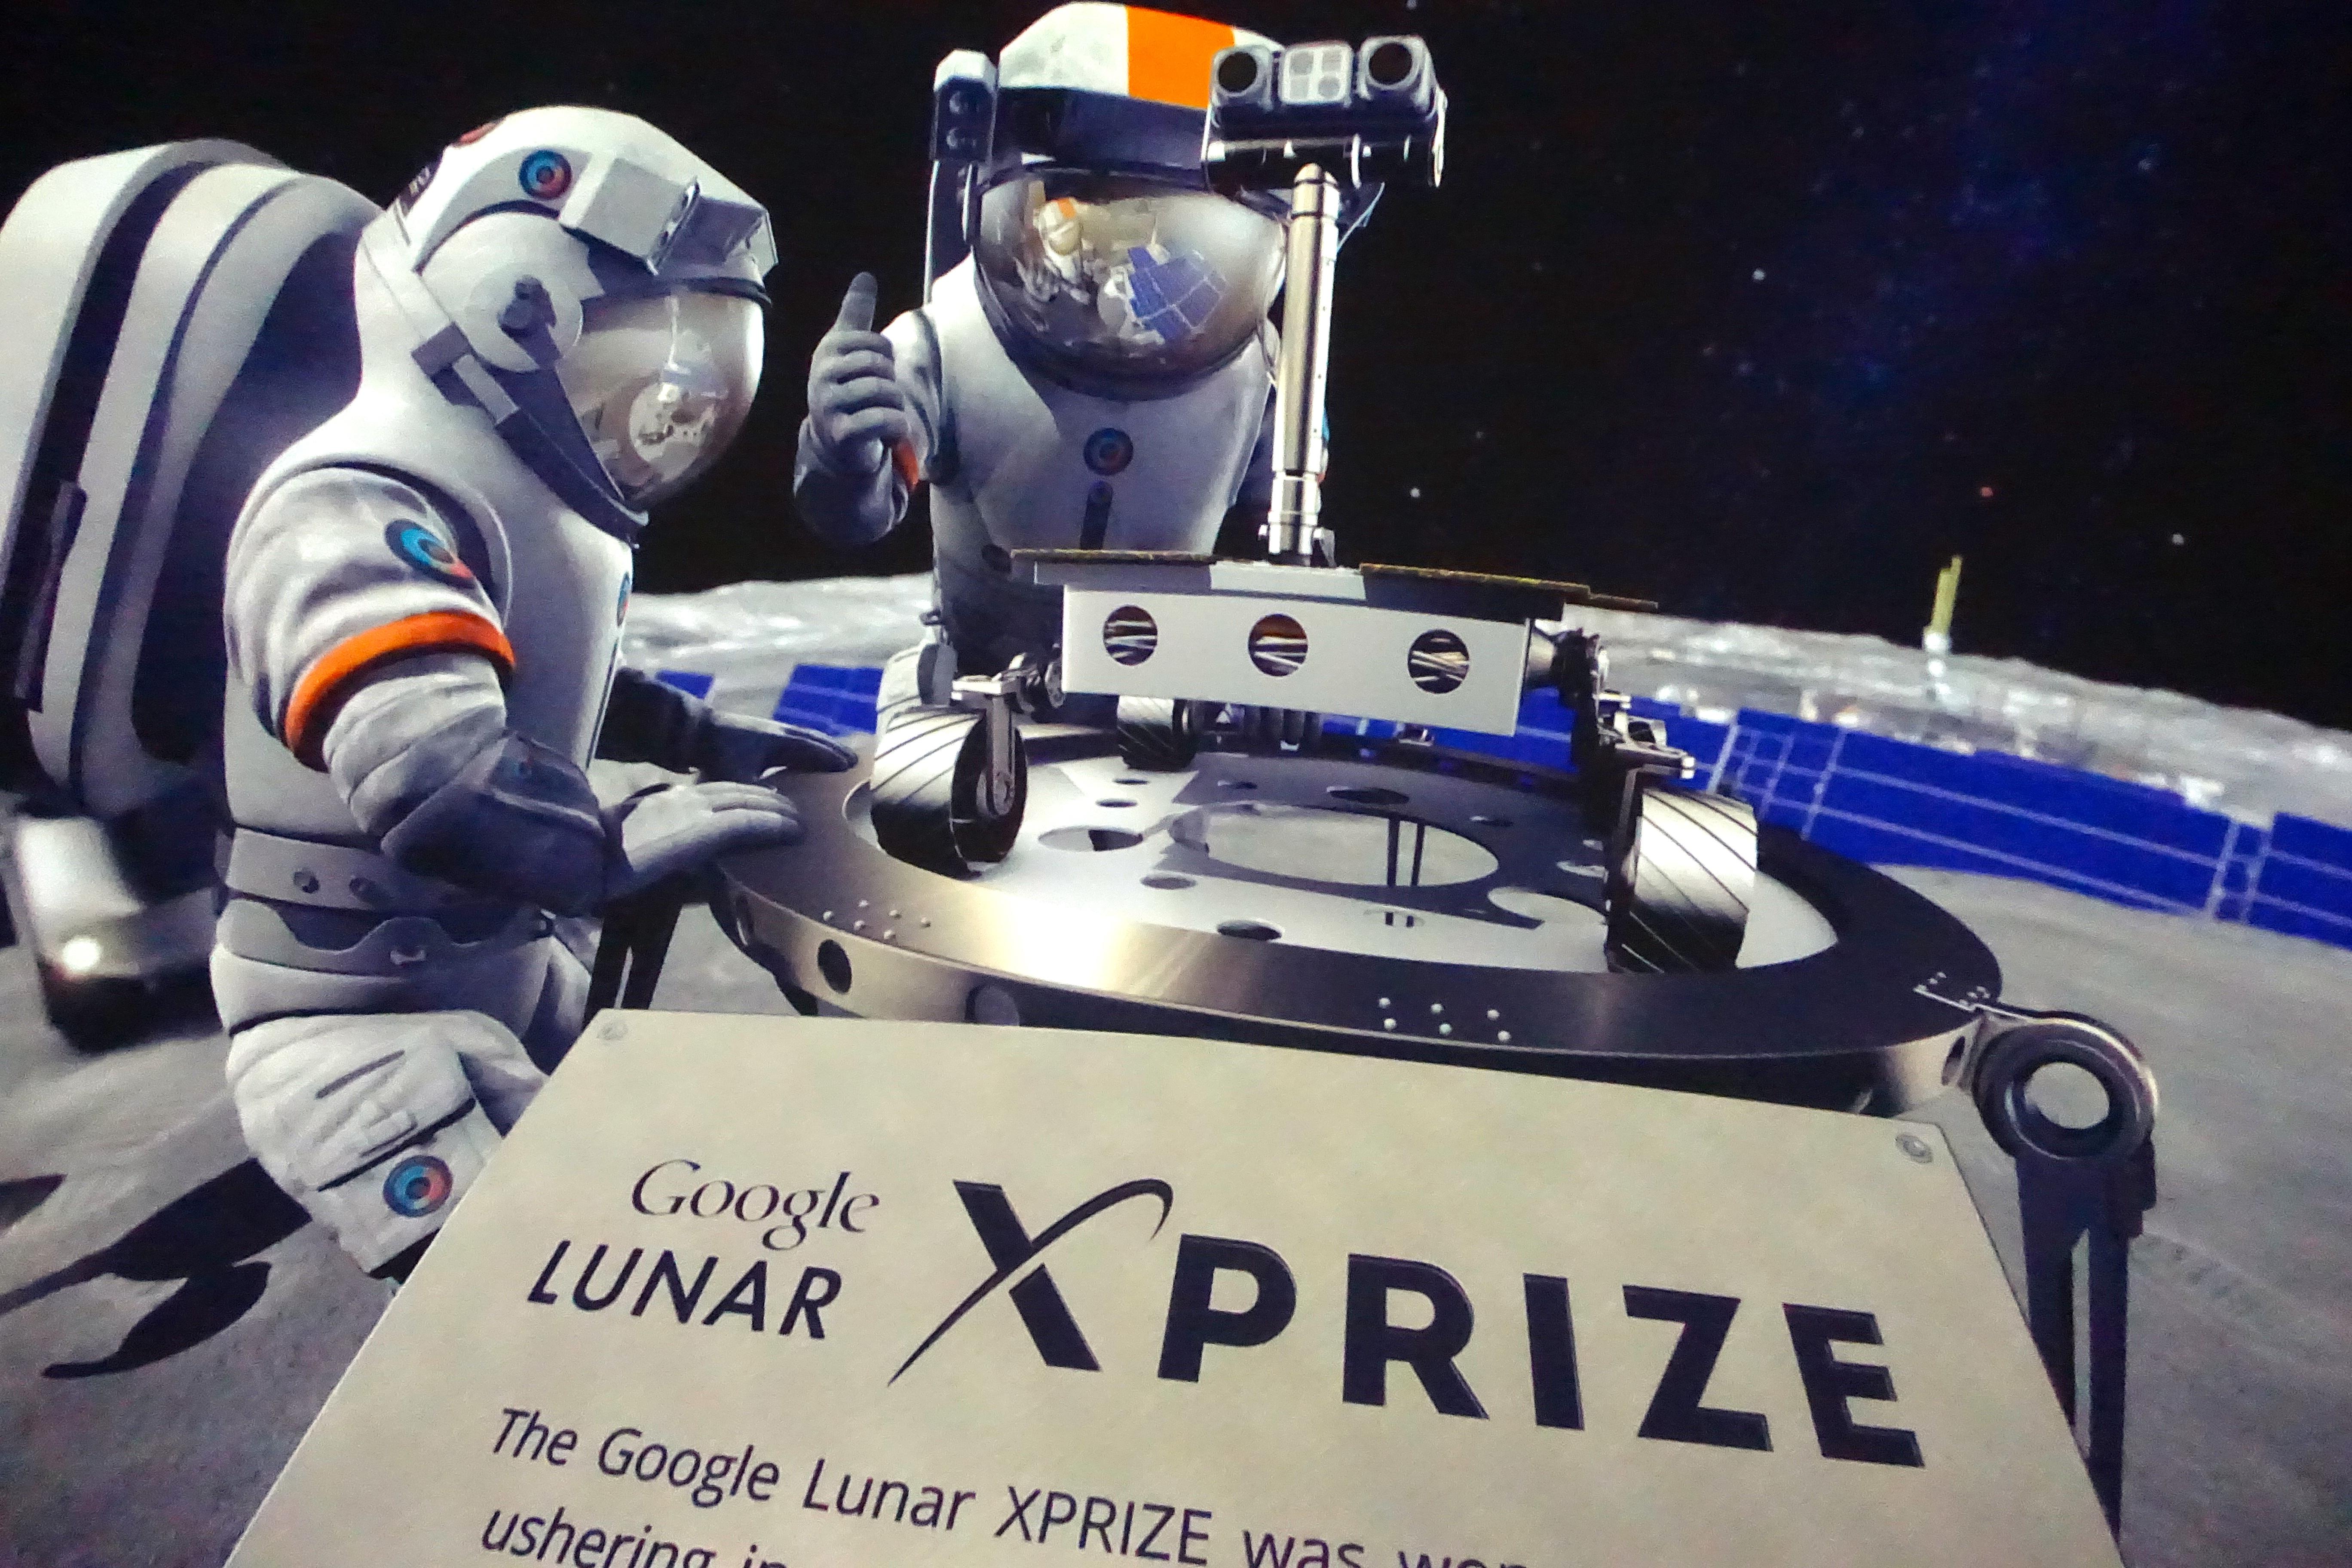 Google's Lunar X Prize